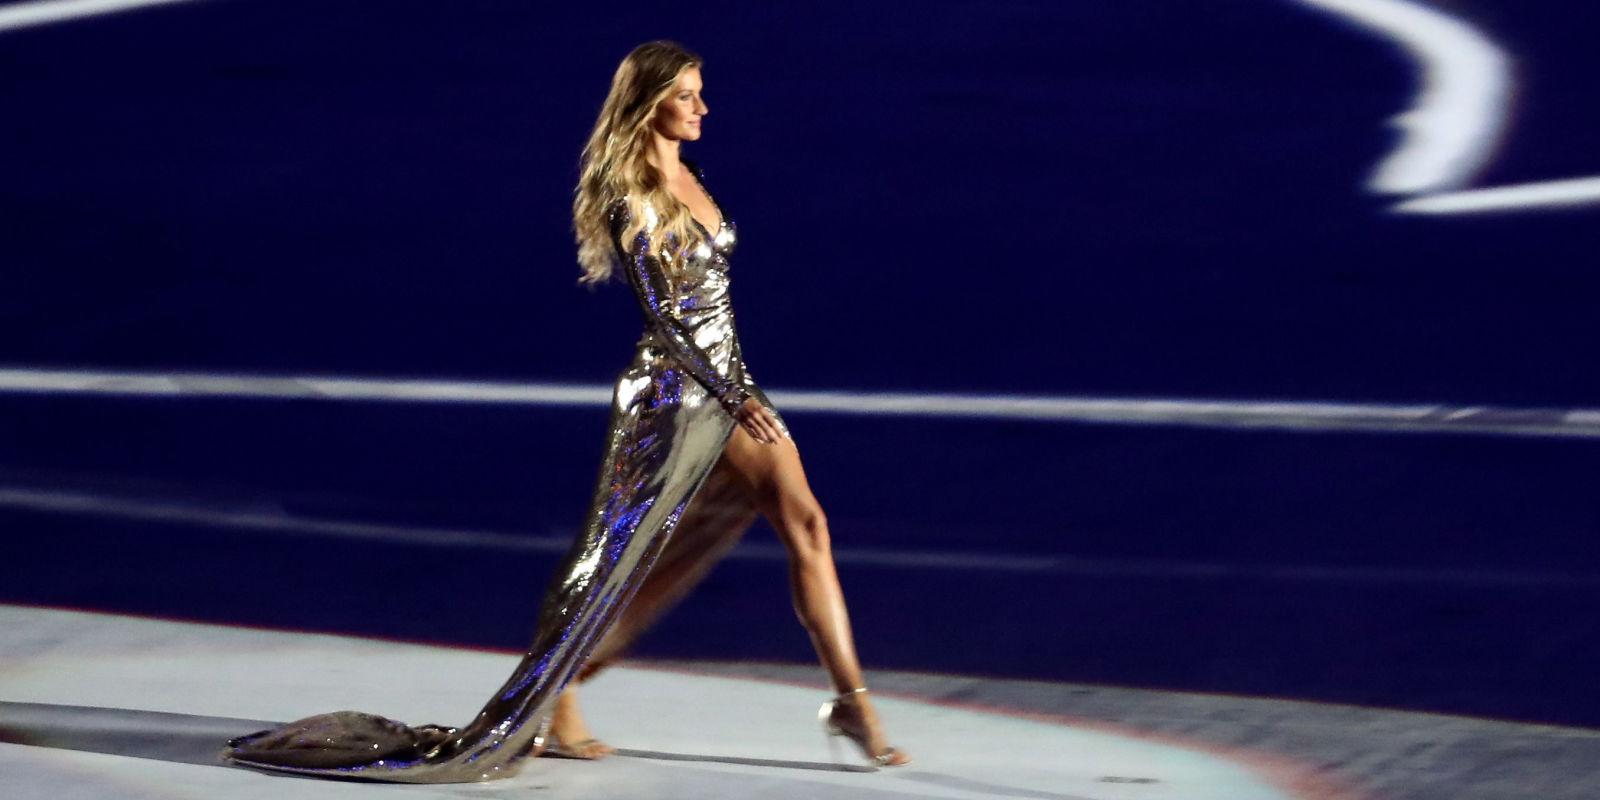 gisele b u00fcndchen runway walk at the olympics opening